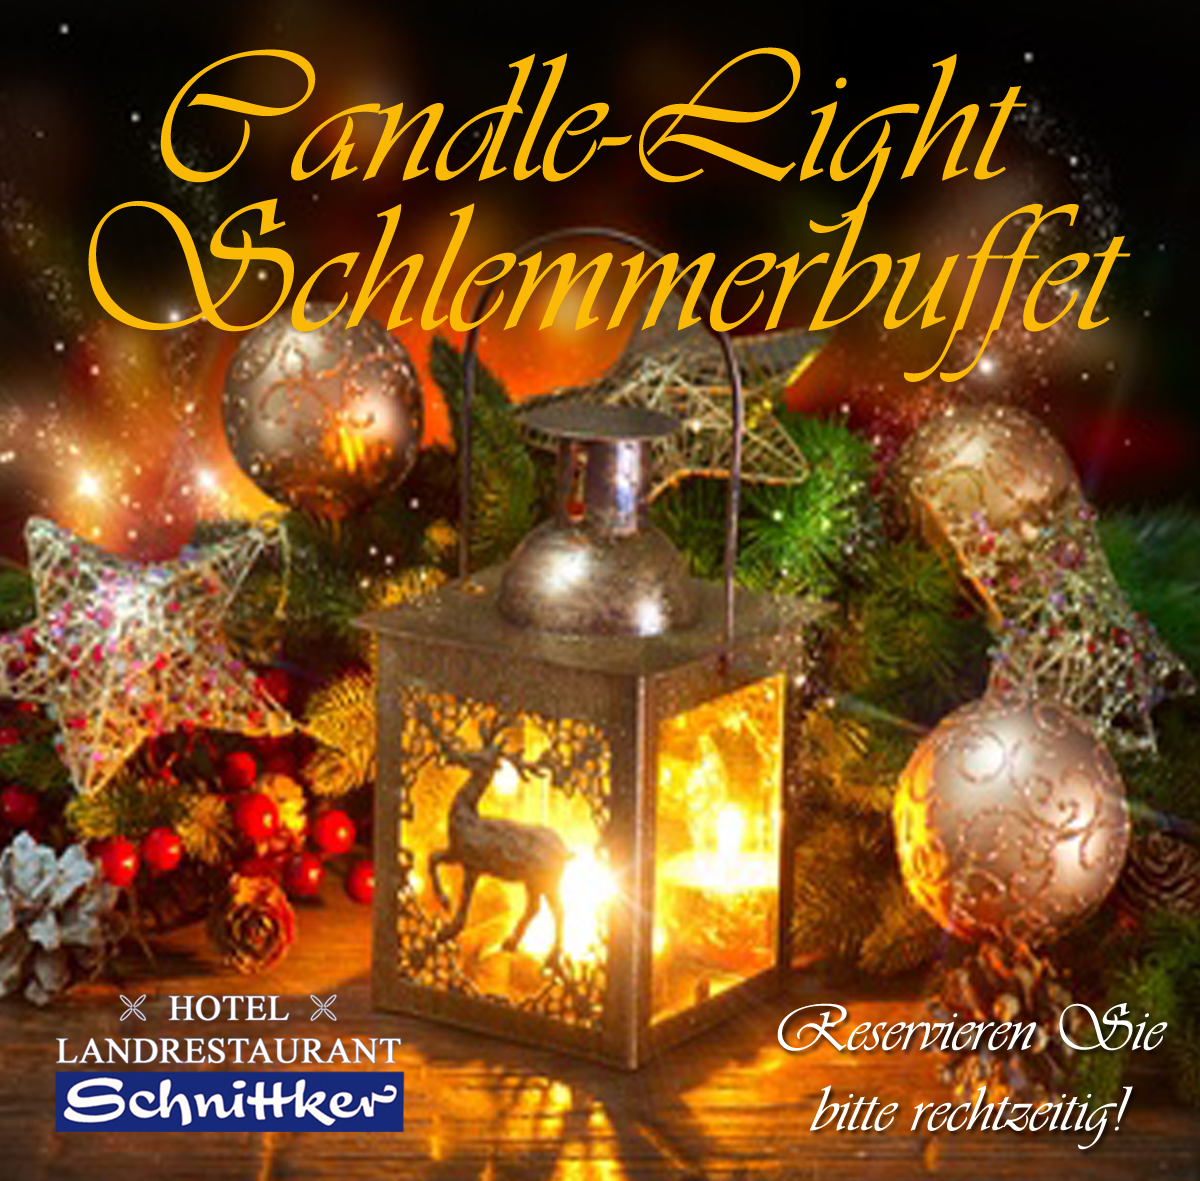 Weihnachts-Candle-Light Buffet